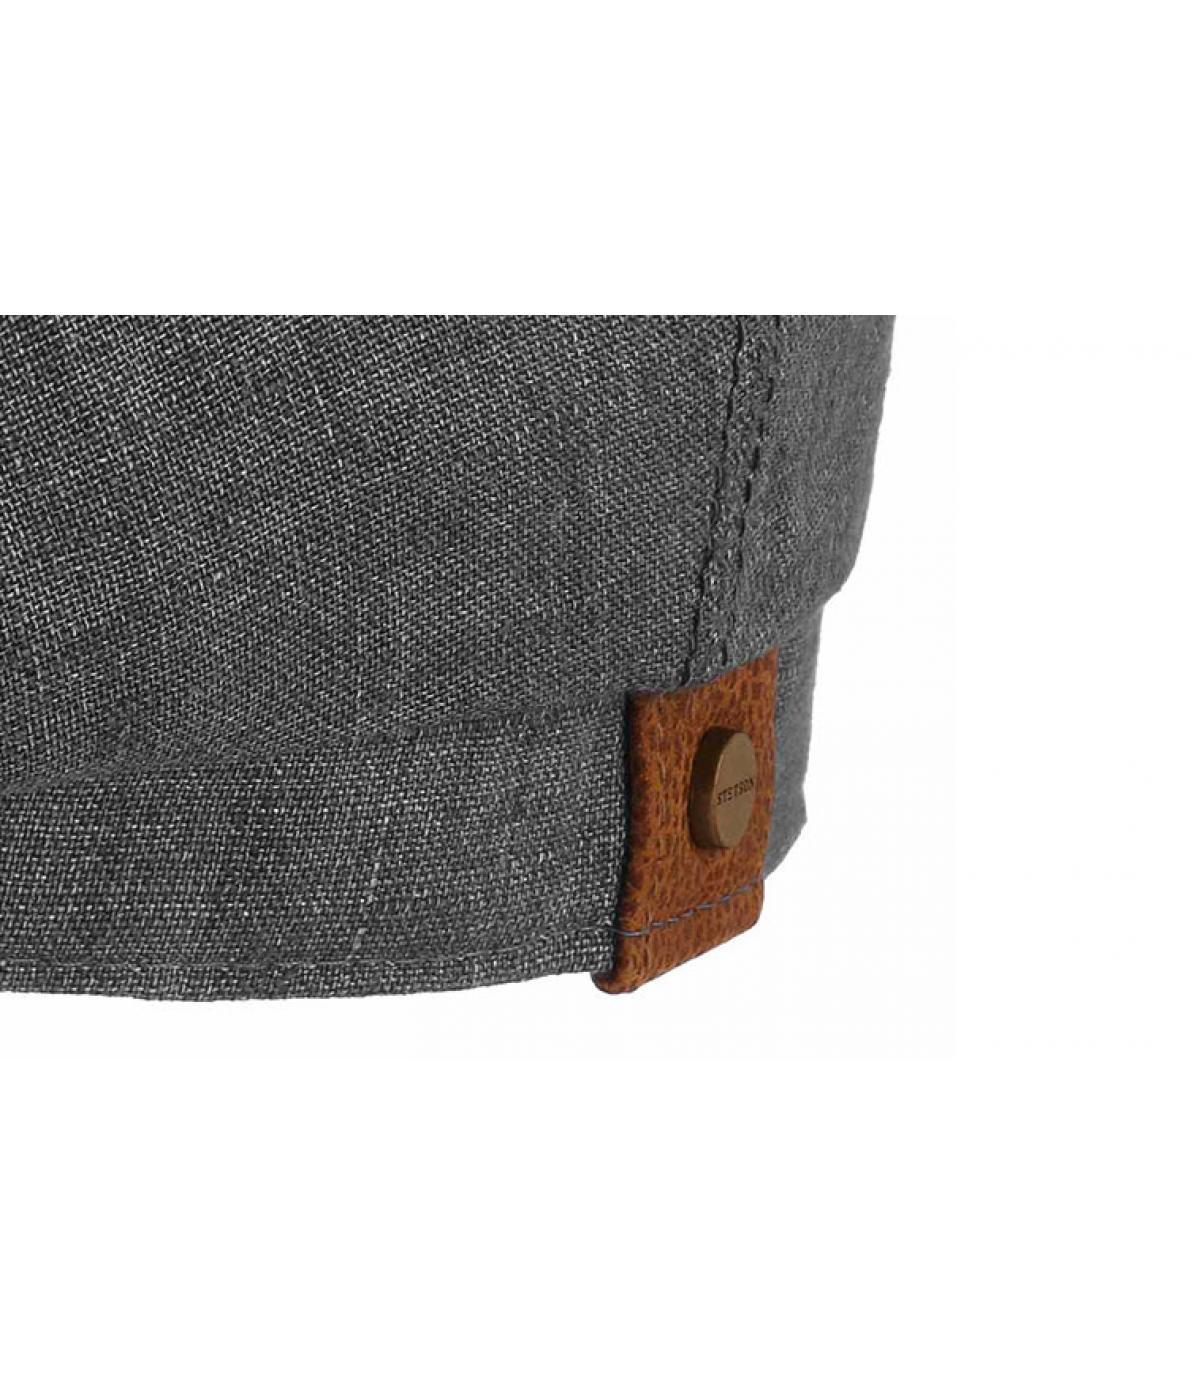 Details Hatteras Linen grey - Abbildung 3